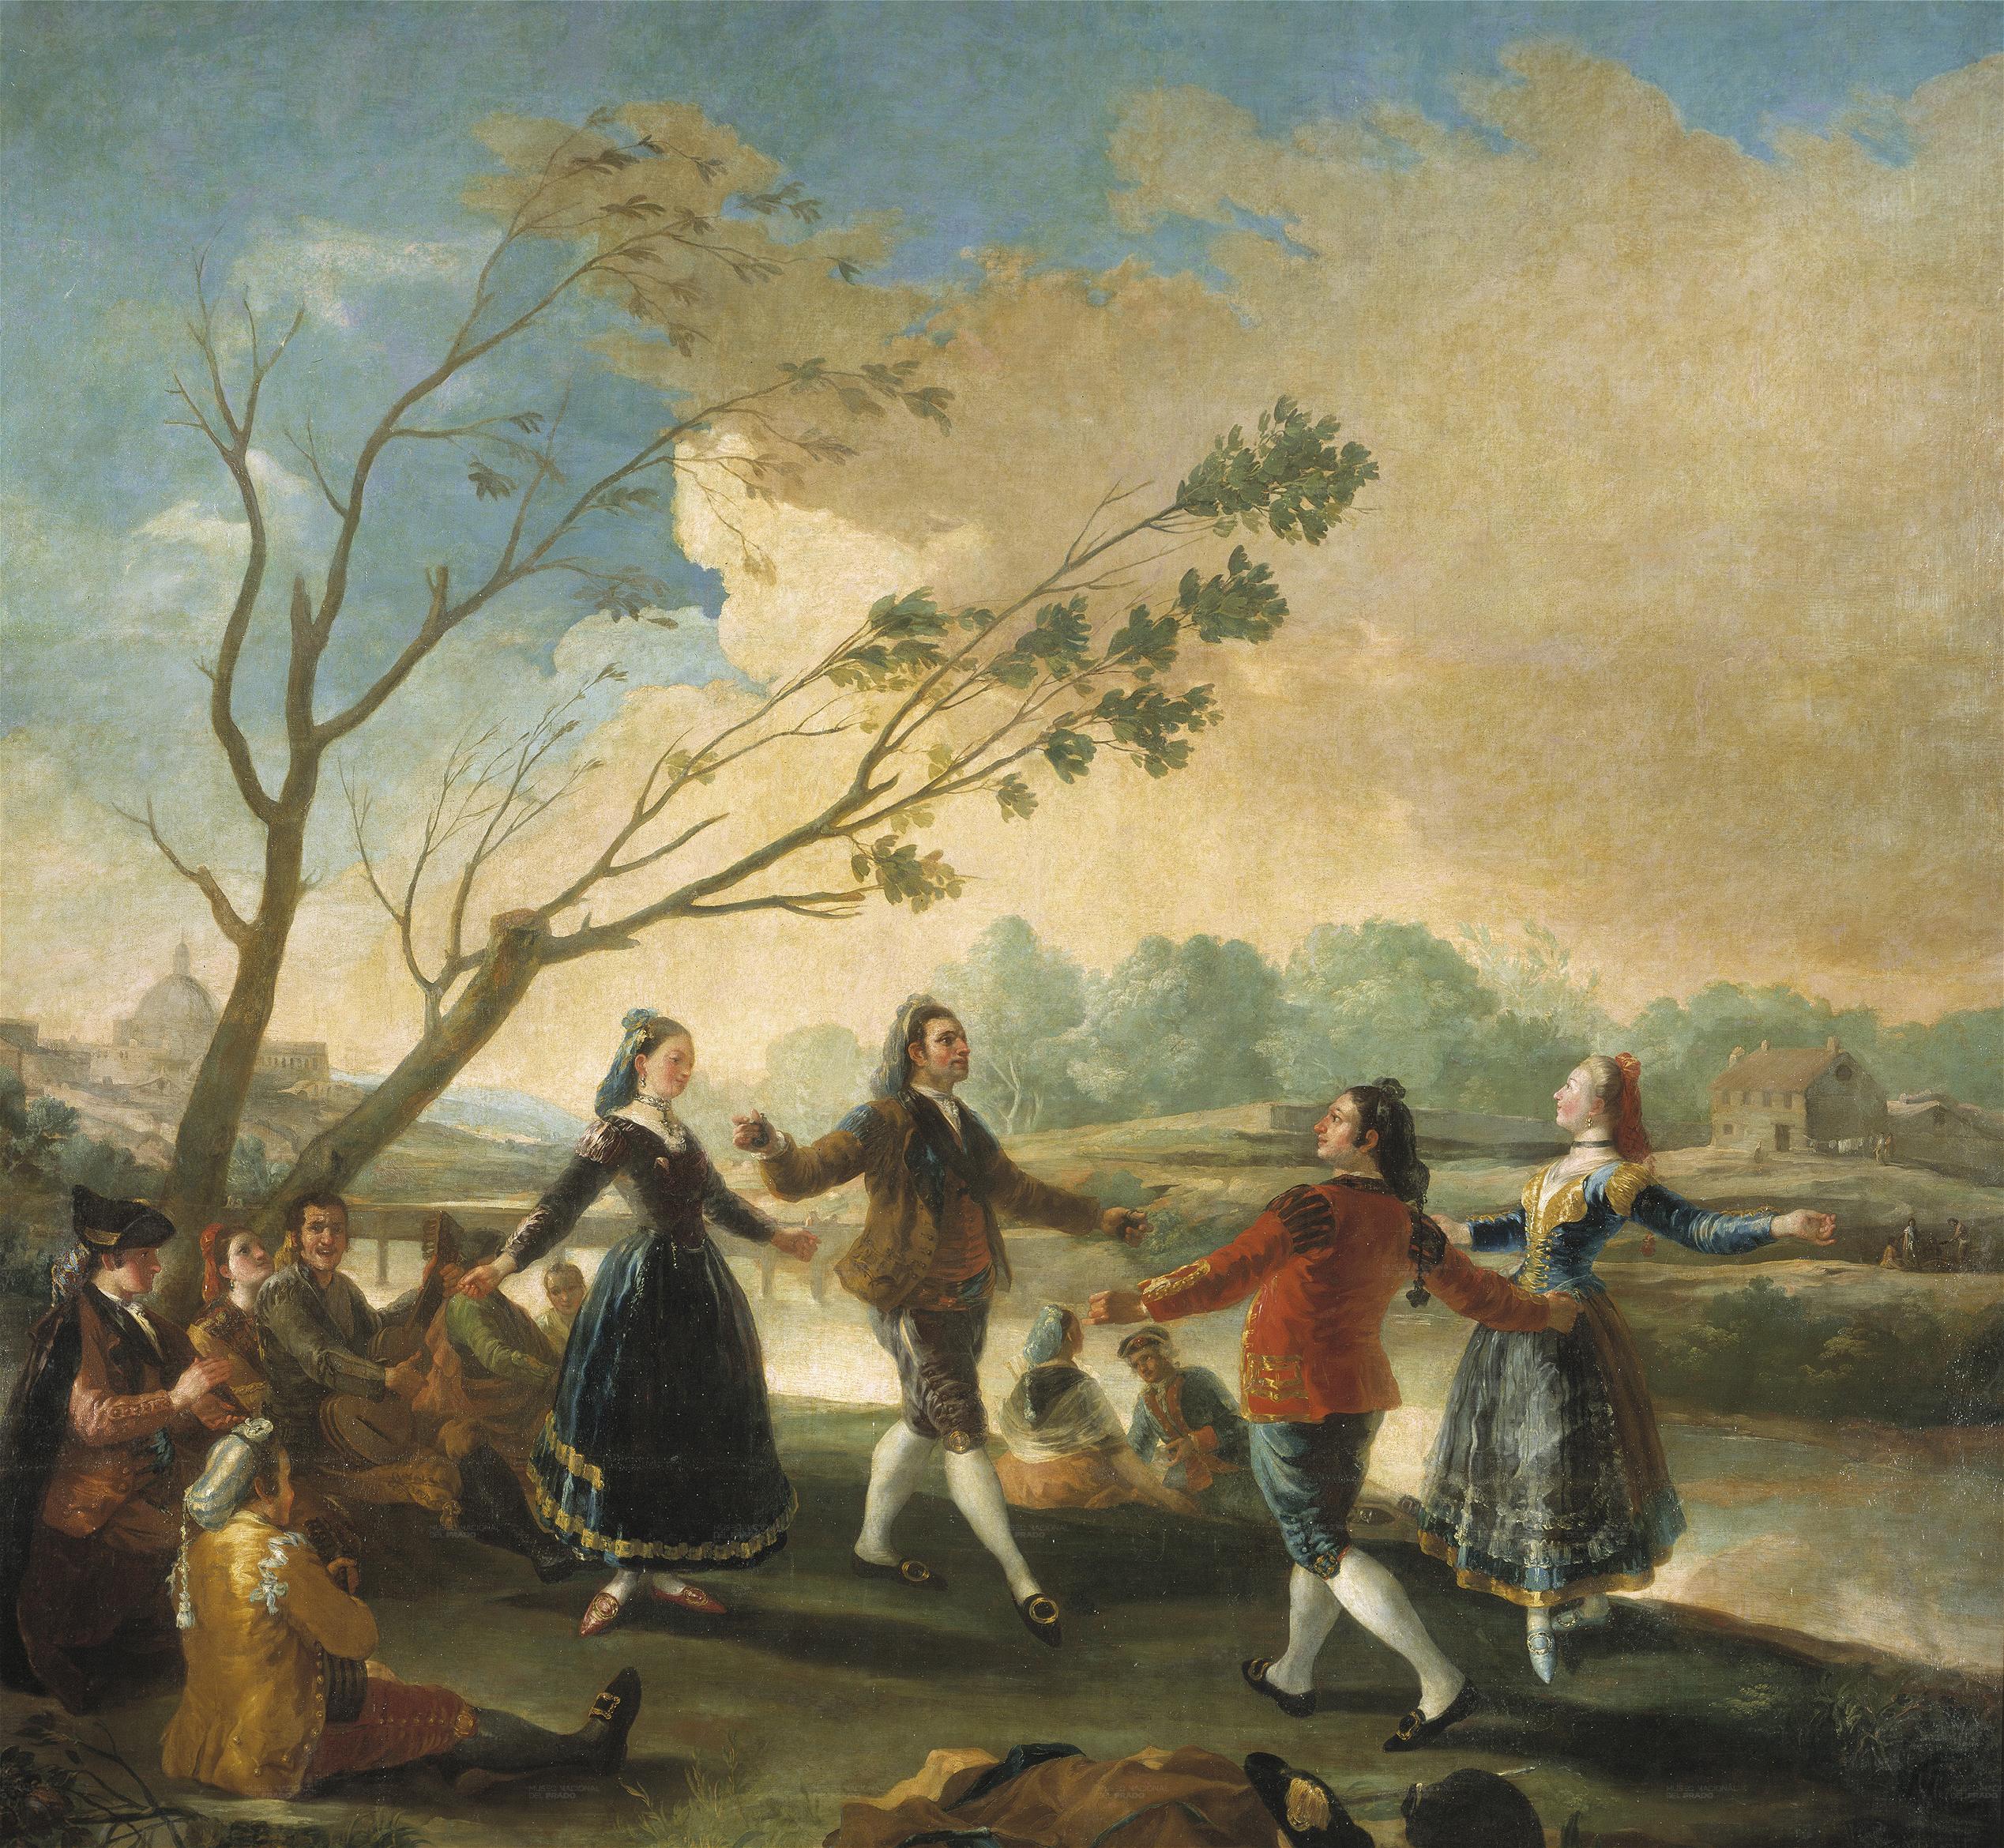 Goya's stylistic development